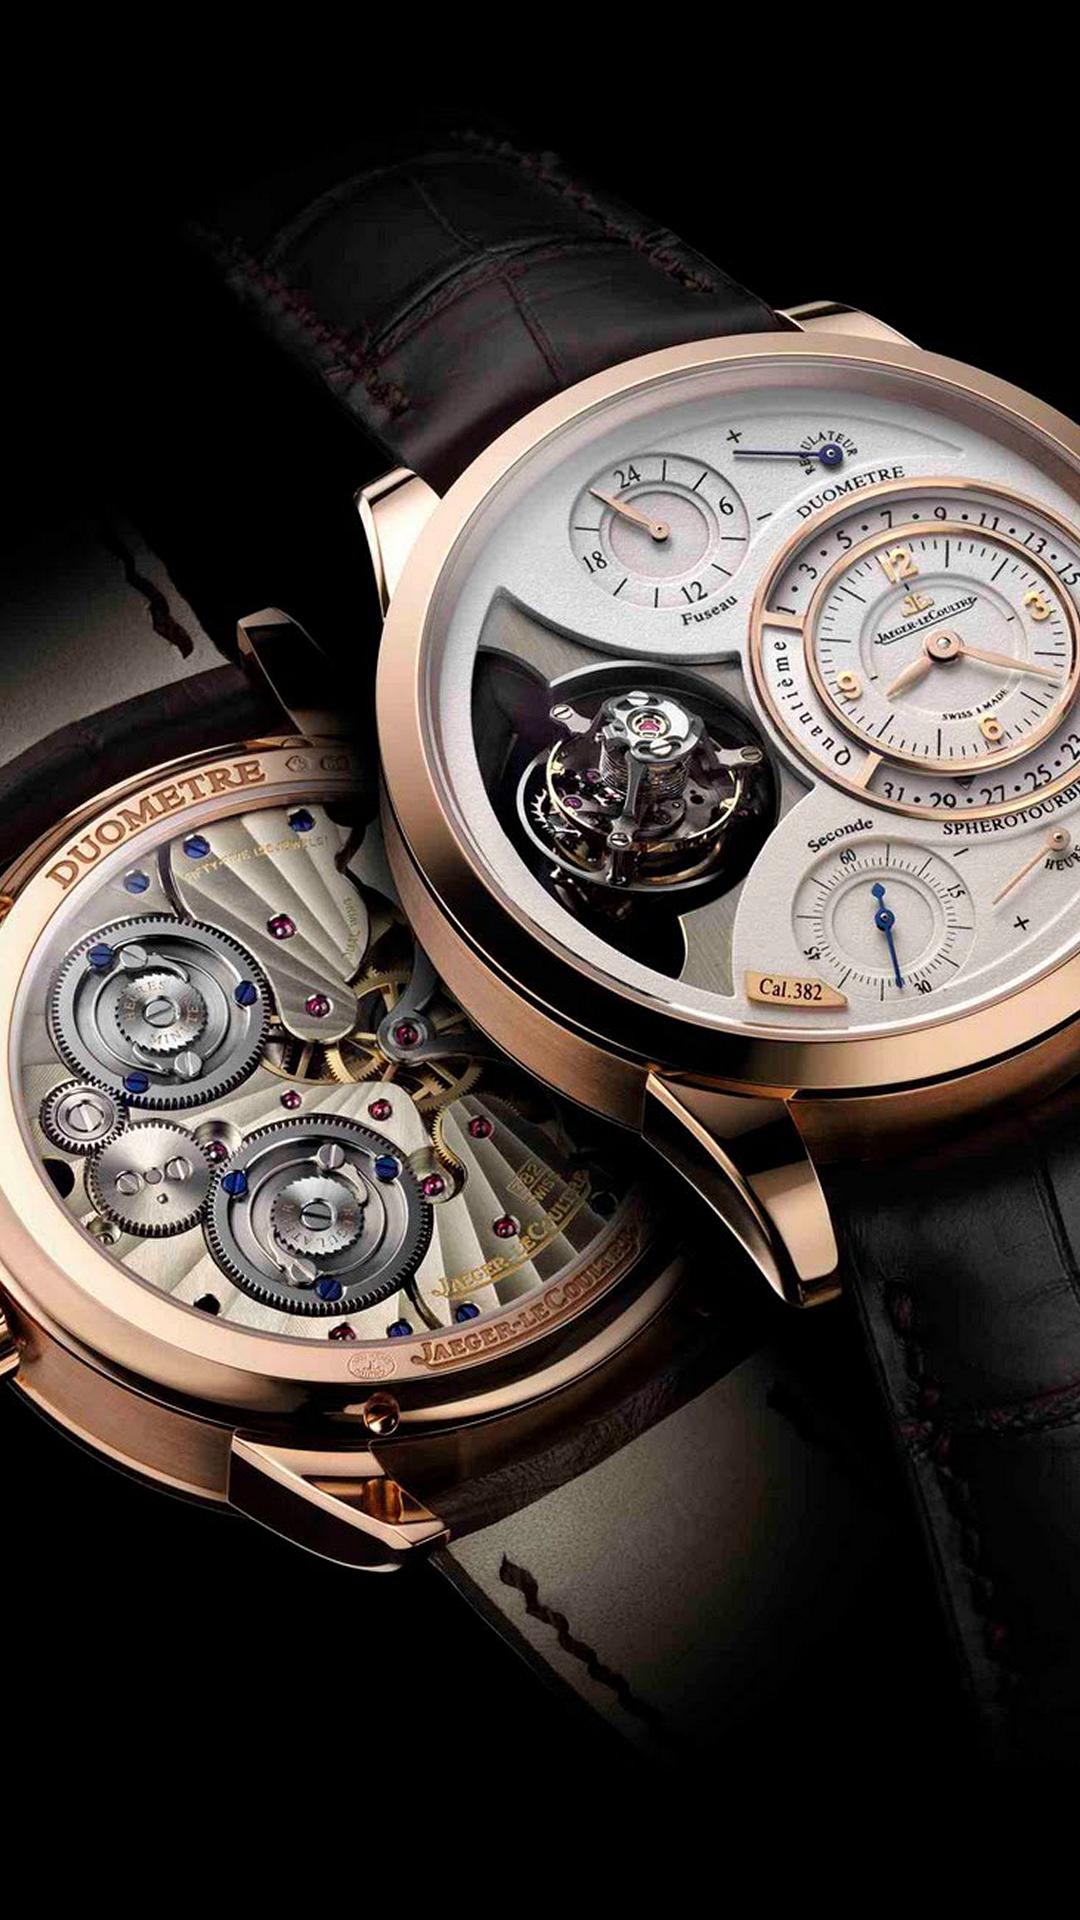 Jaeger-LeCoultre Luxury Watch, wallpapers for Samsung Galaxy S4, fondos galaxy s4, fondos de pantalla galaxy s4, sfondi samsung galaxy s4, hintergrund HD 1080x1920